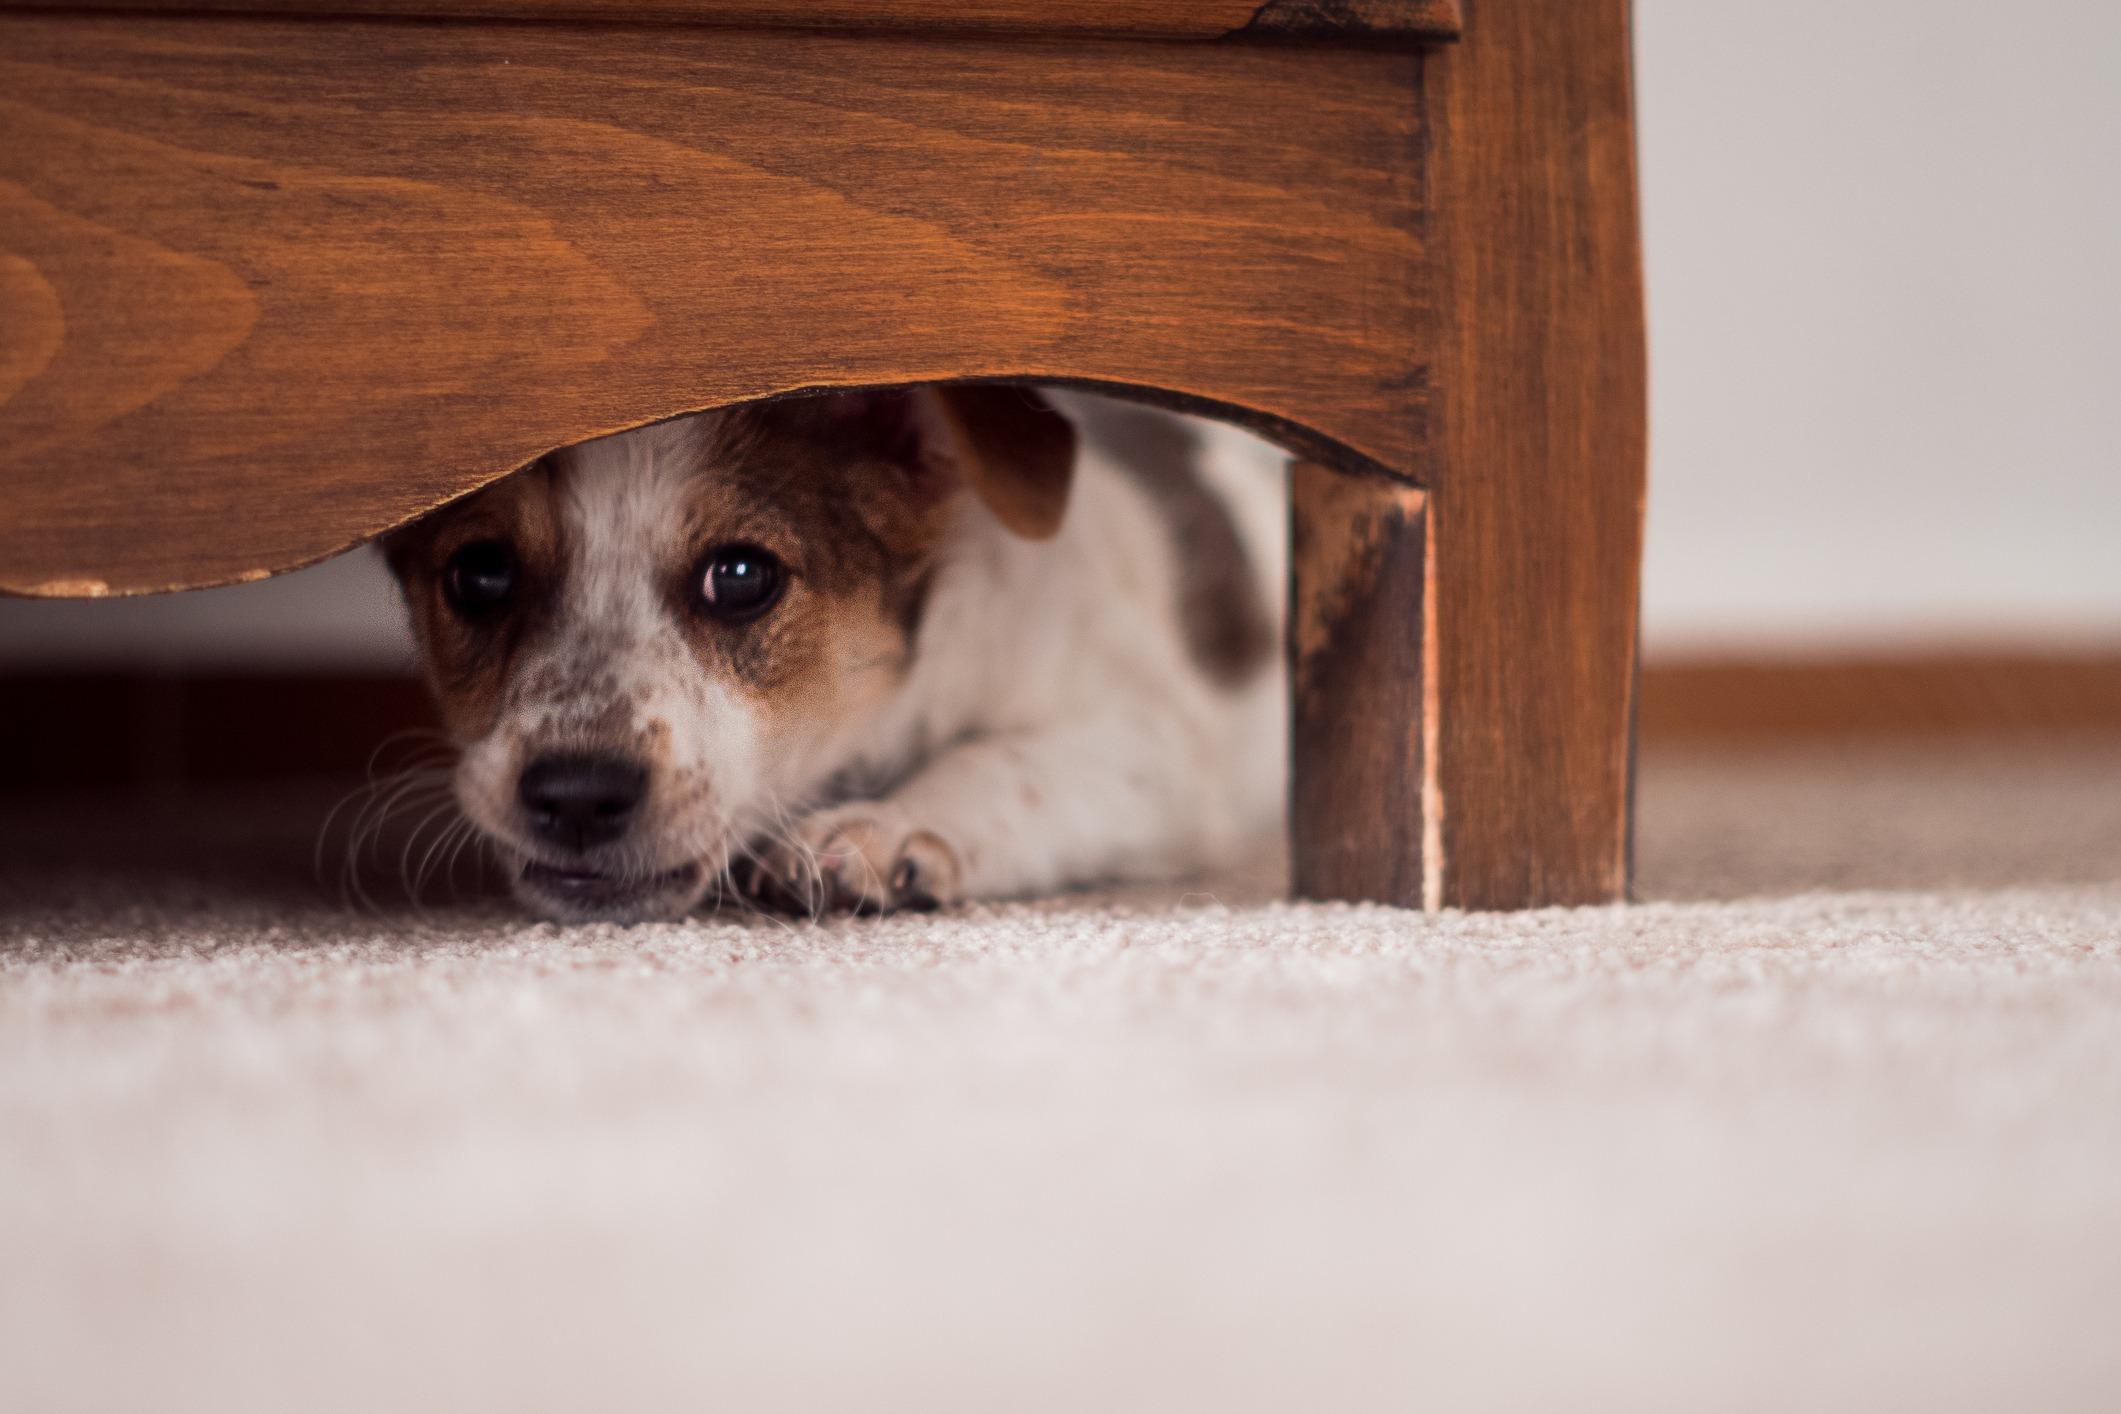 Puppy hiding under a cabinet